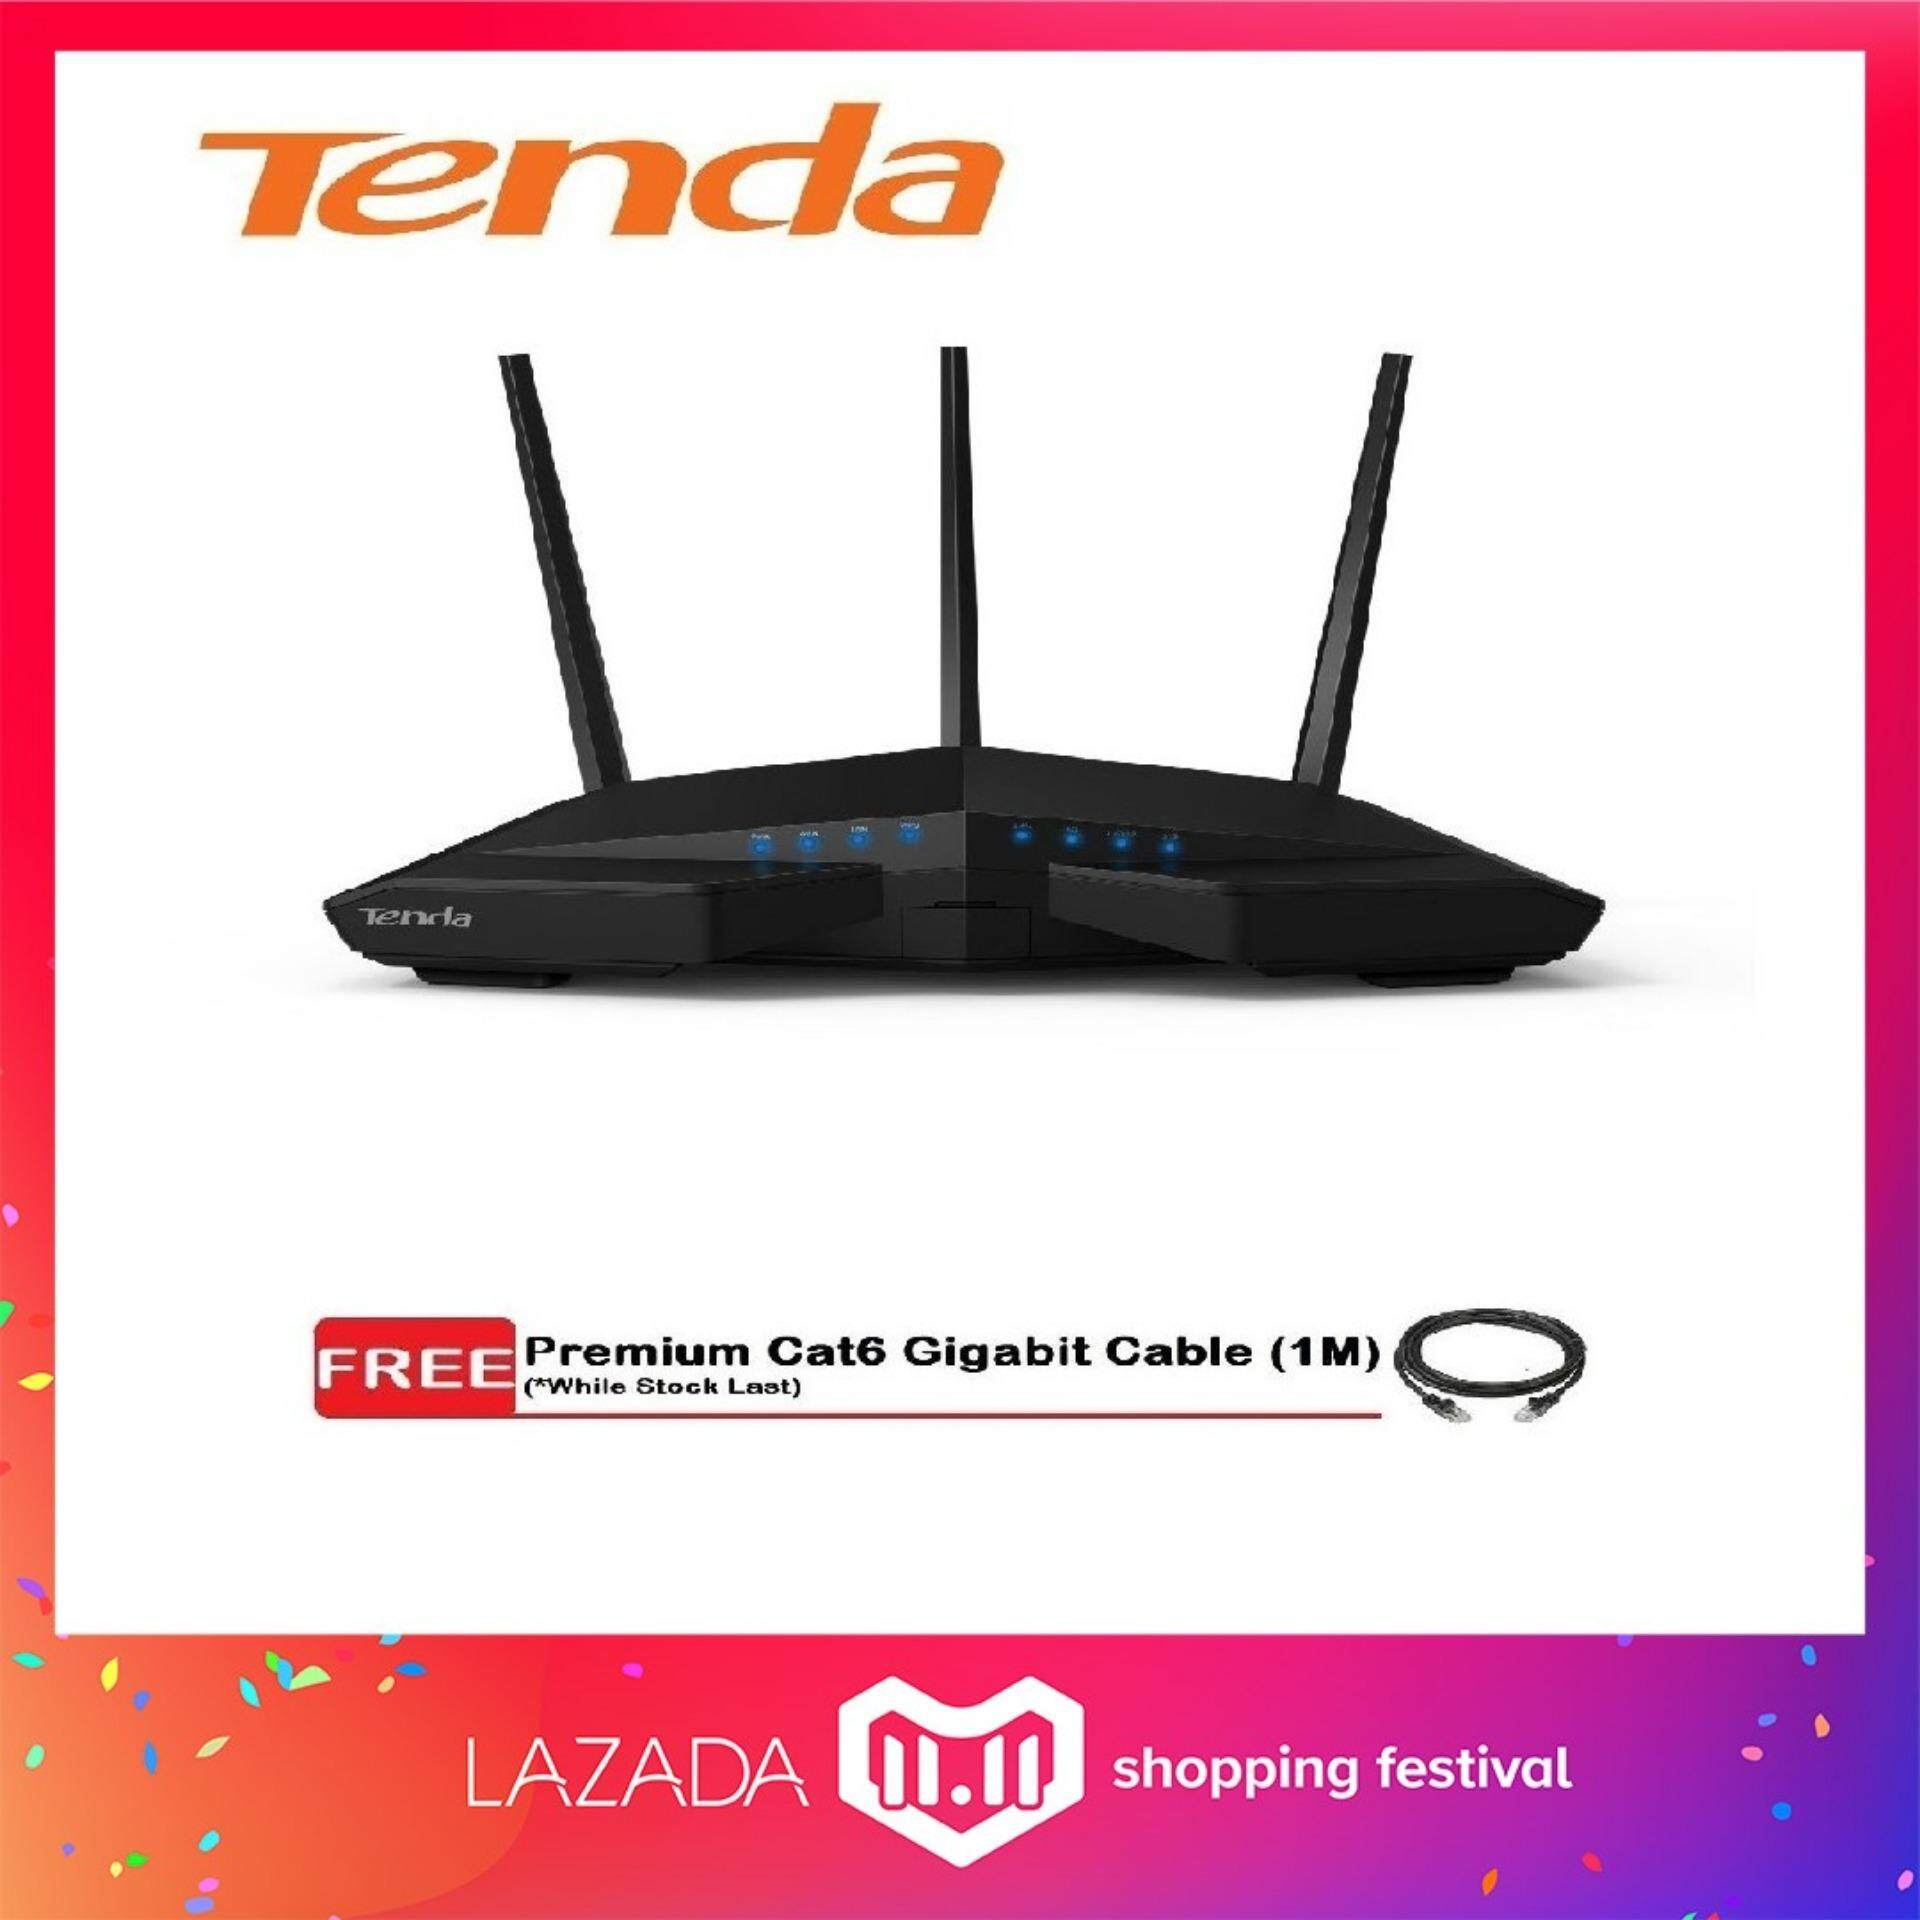 Tenda Routers Price In Malaysia Best Lazada N301 Wireless Router 3 1 Ac18 Ac1900 Smart Dual Band Gigabit Wifi Unifi Maxis Time Fiber